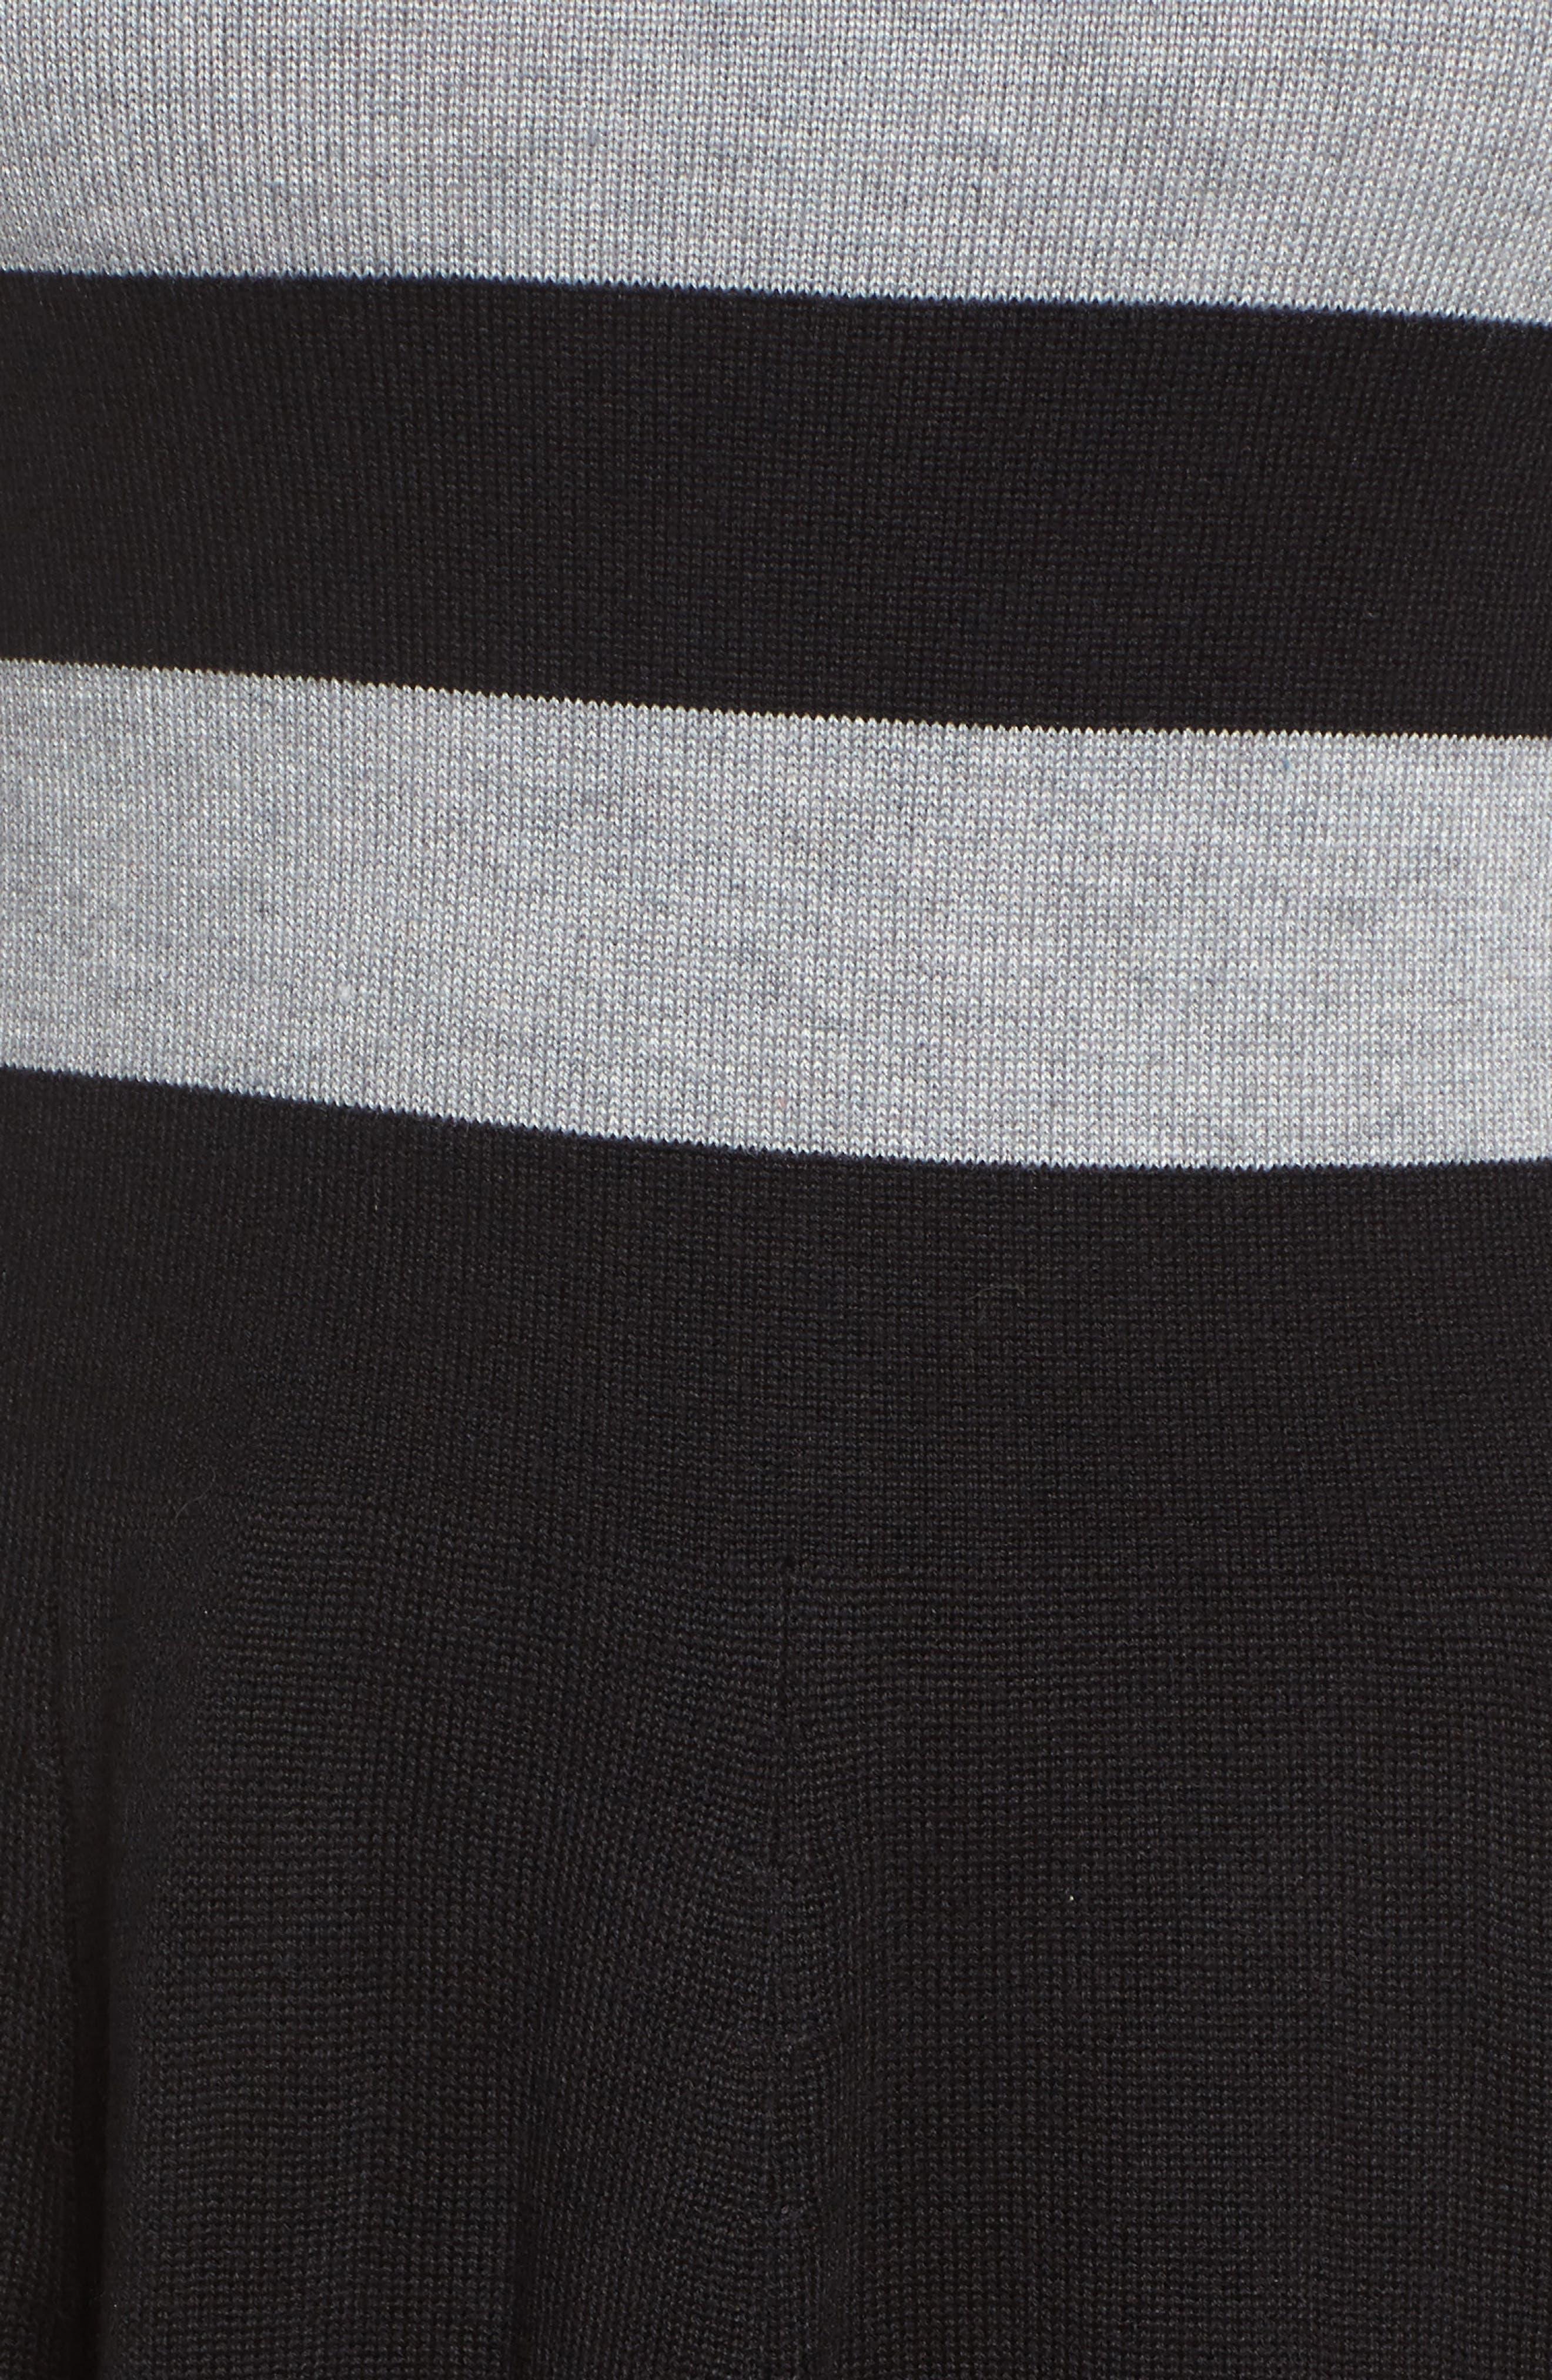 Fit & Flare Sweater Dress,                             Alternate thumbnail 5, color,                             Multi